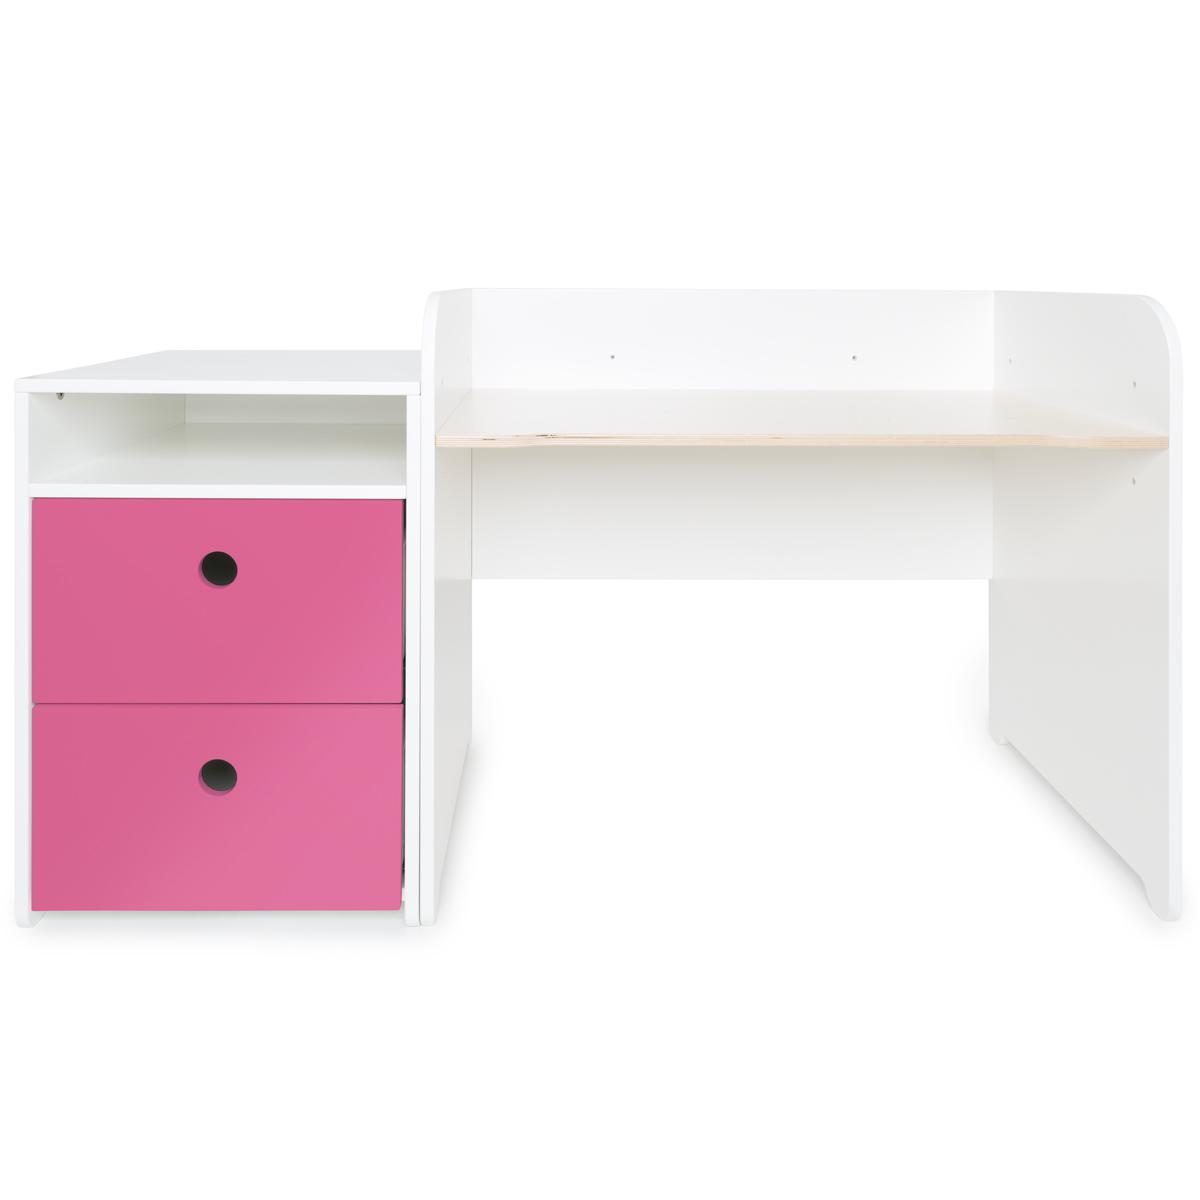 Bureau évolutif-petit meuble 2 tiroirs COLORFLEX Abitare Kids pink